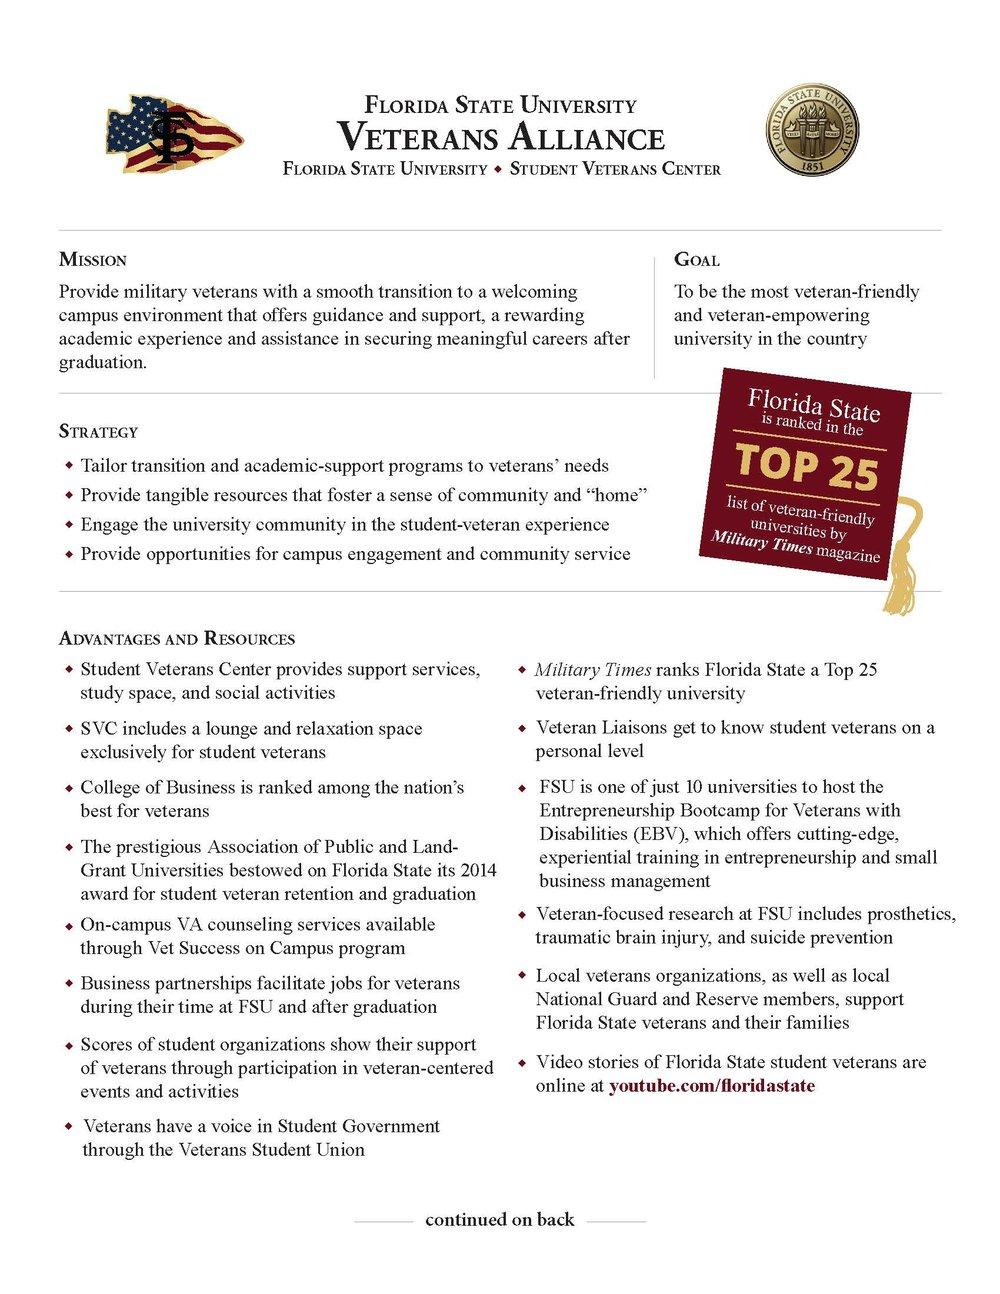 veterans_alliance_info_sheet_2016_revised_Page_1.jpg